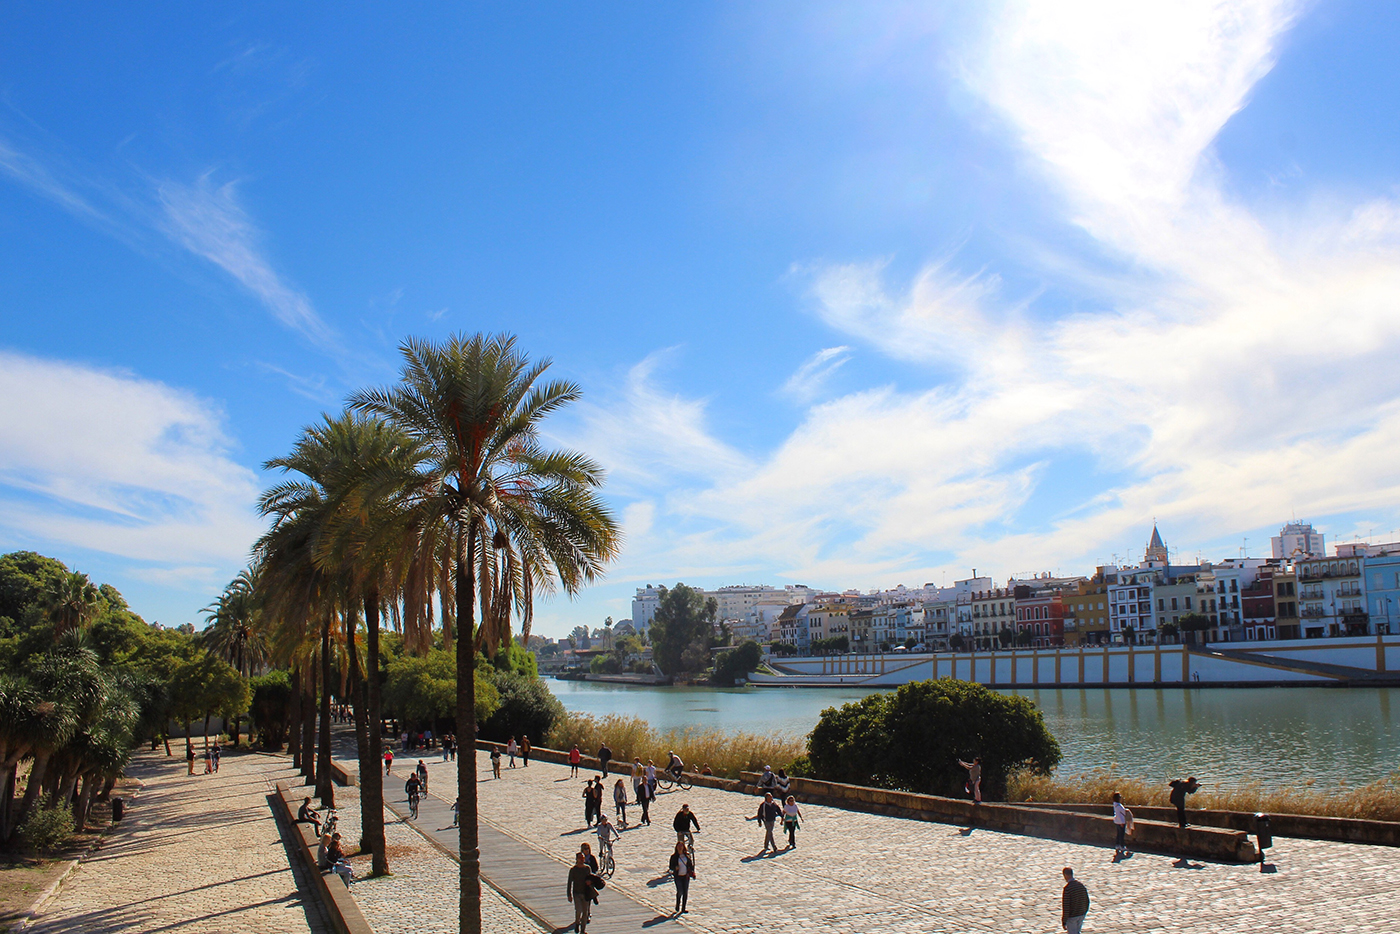 In Welke Spaanse Stad Staat Het Beroemde Alhambra.Rondreis Andalusie Sevilla Granada Cordoba Spanje